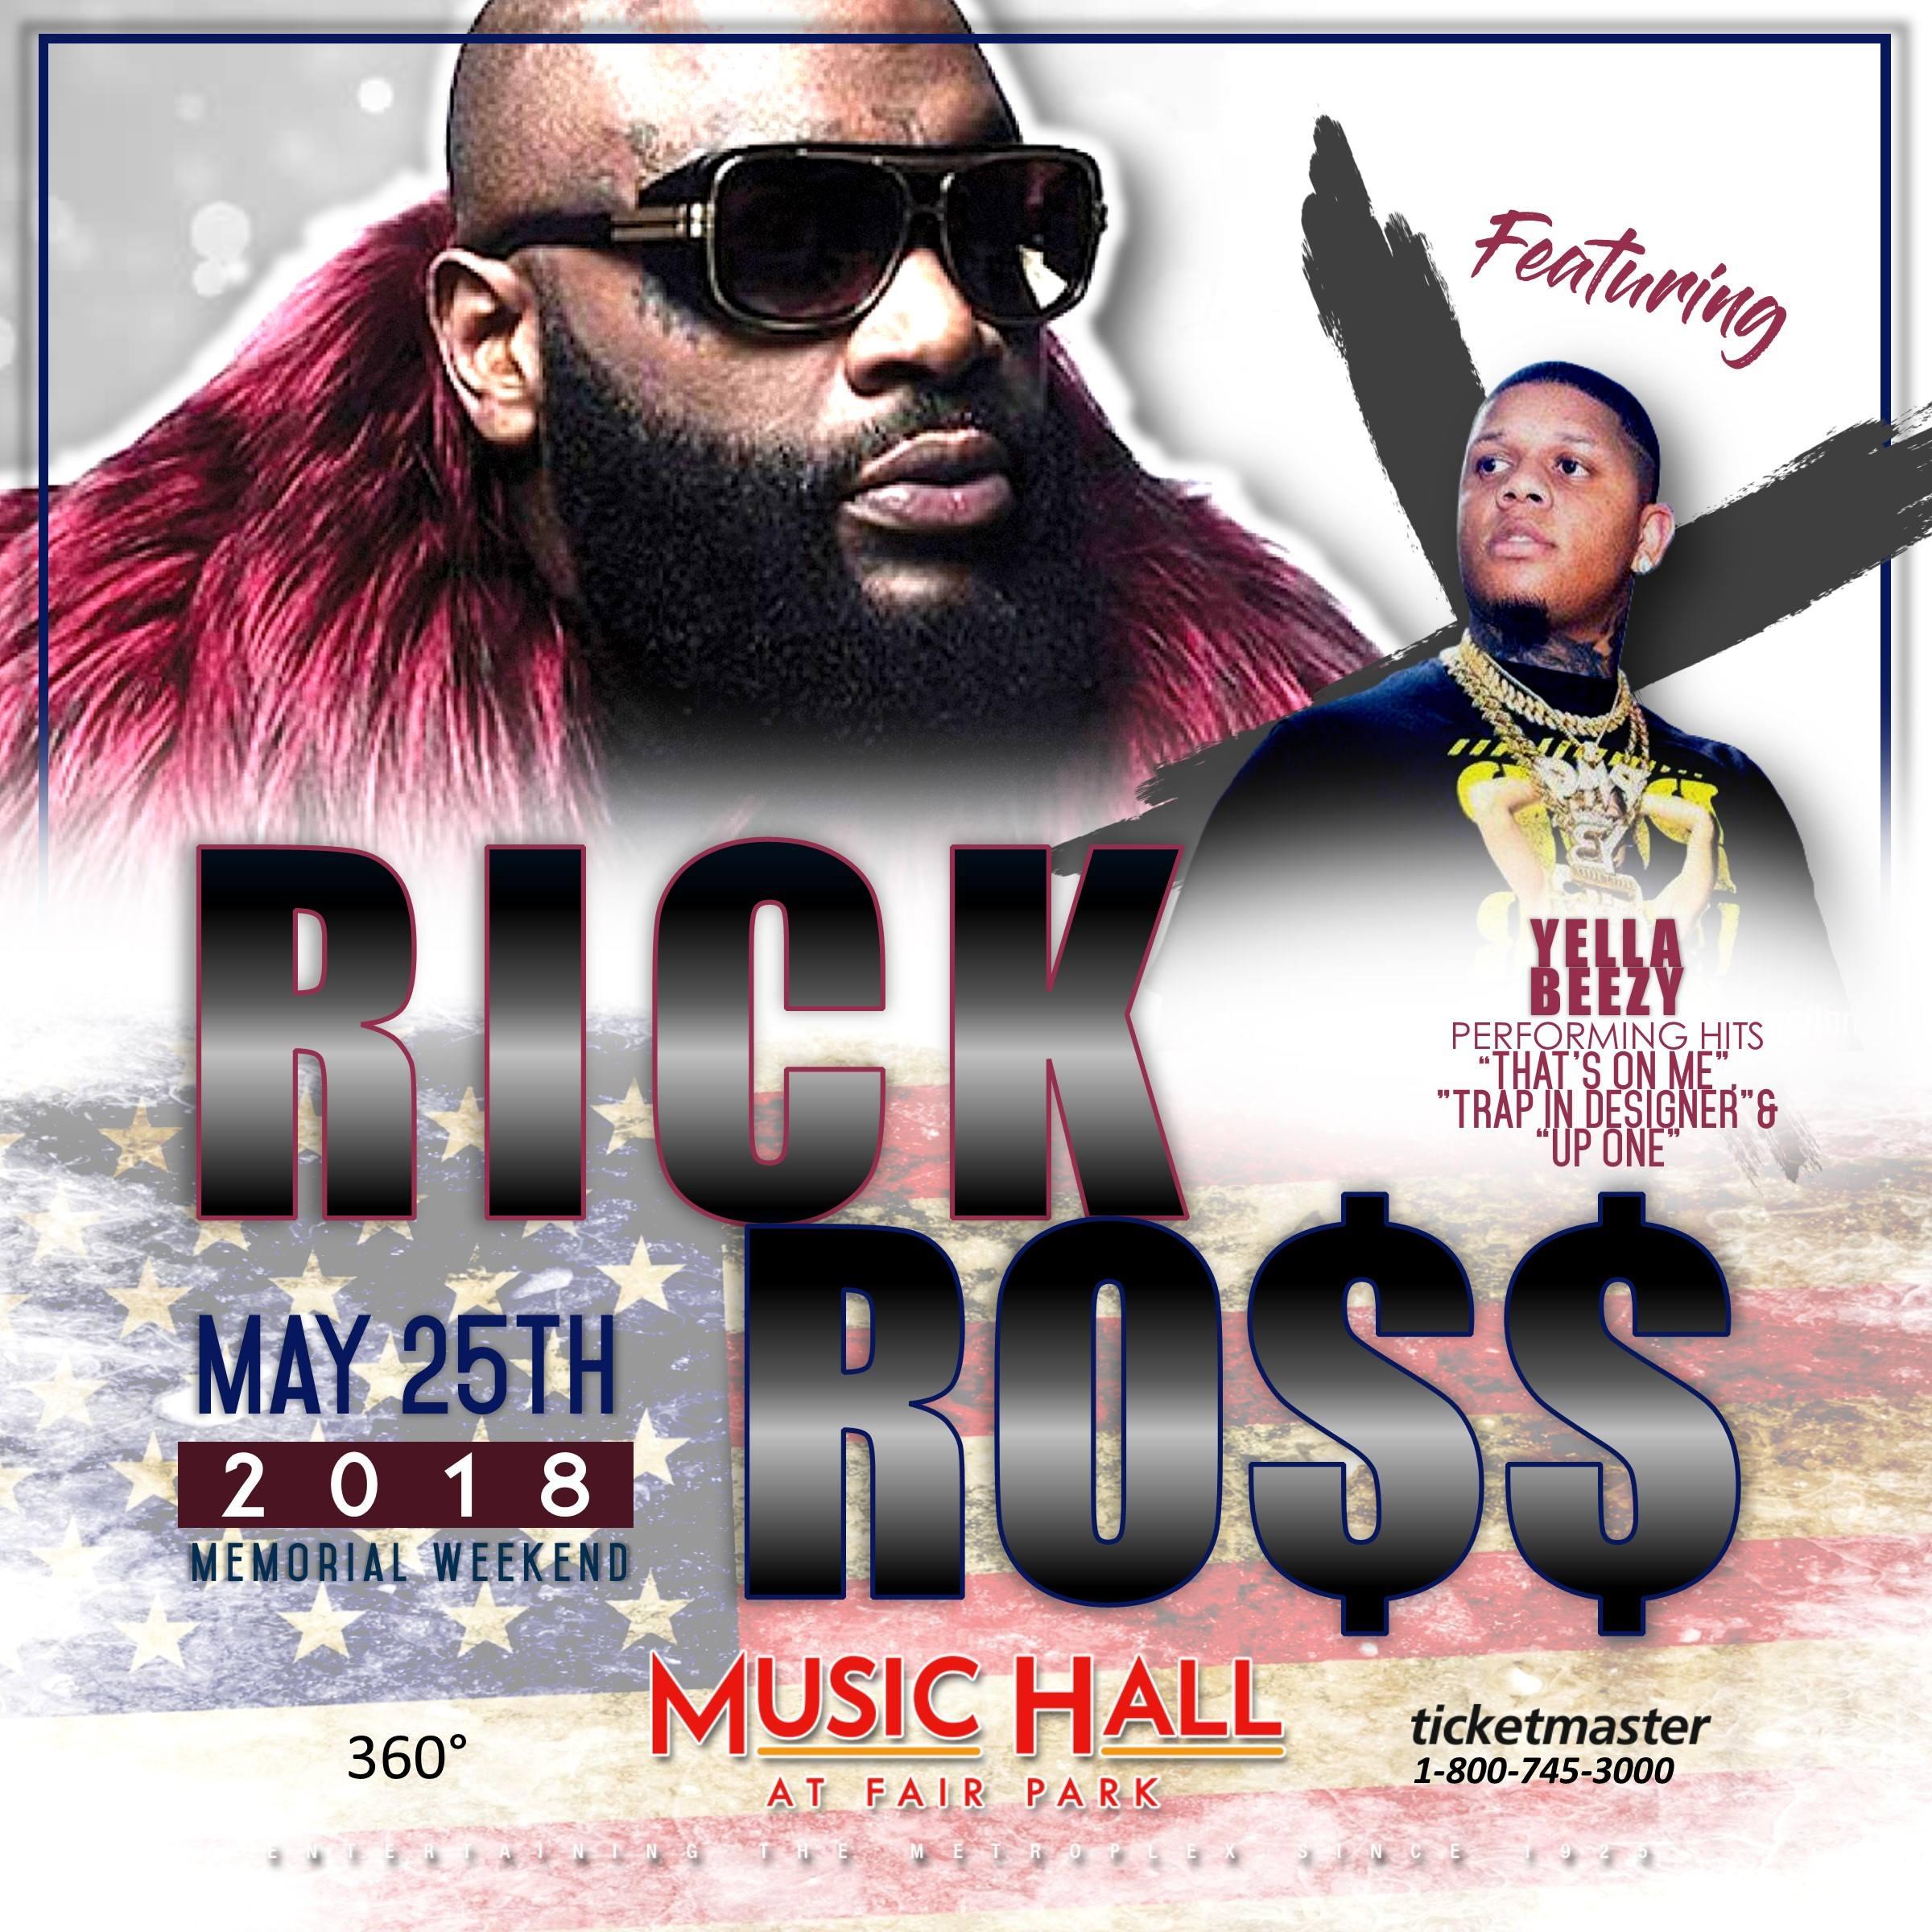 RICK ROSS - 5/25 - MUSIC HALL AT FAIR PARK